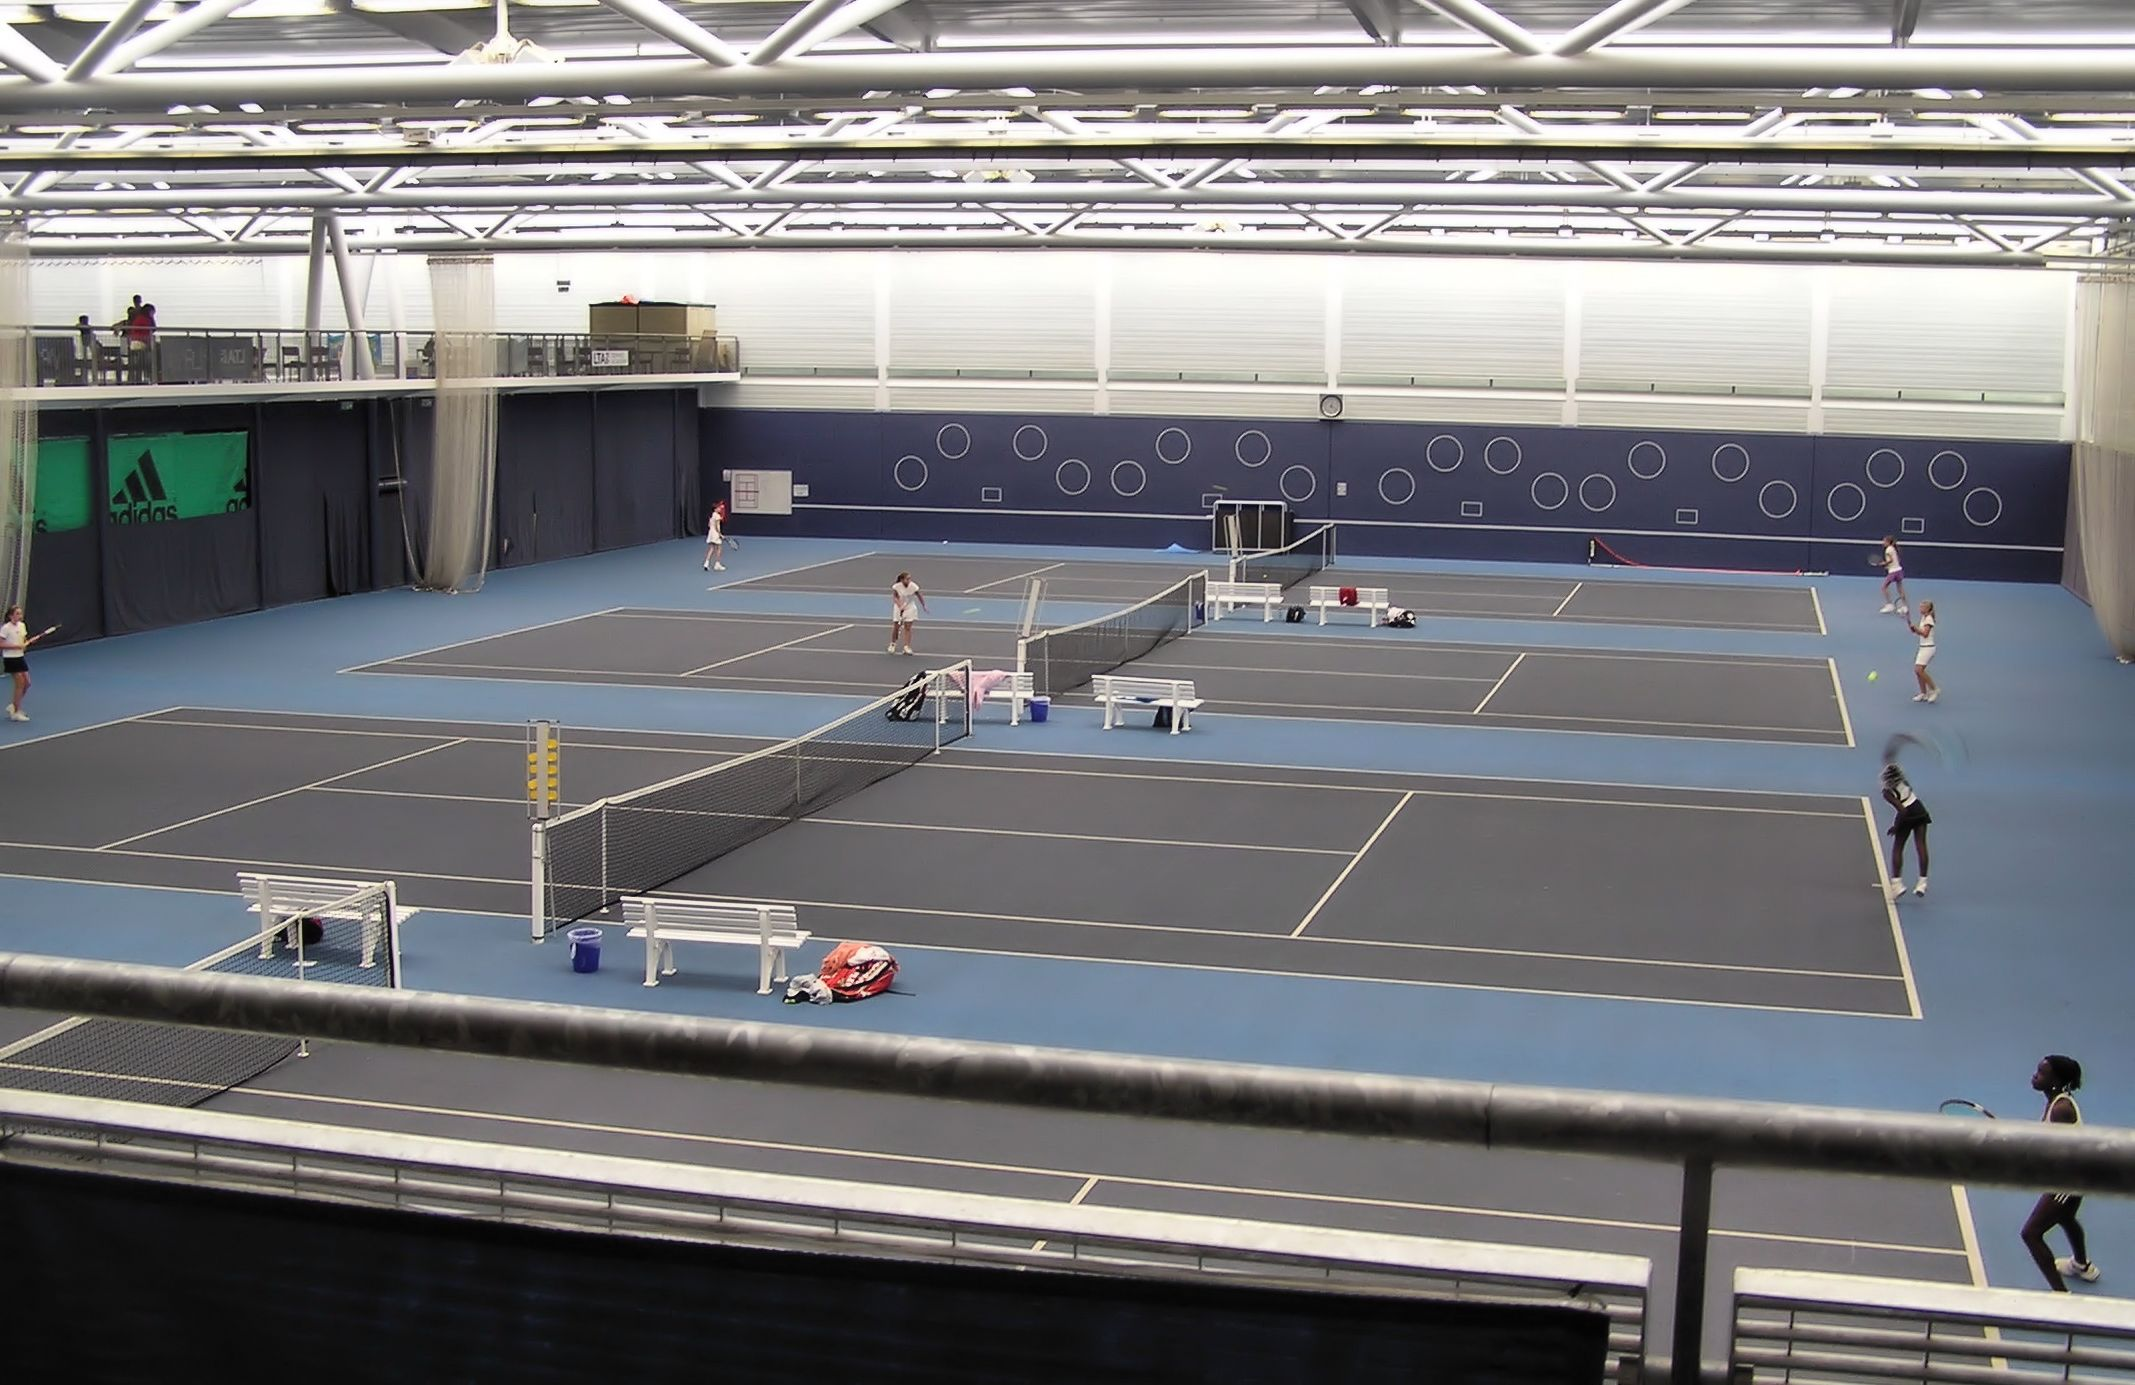 23 best Tennis images on Pinterest | Indoor tennis, Tennis and Centre